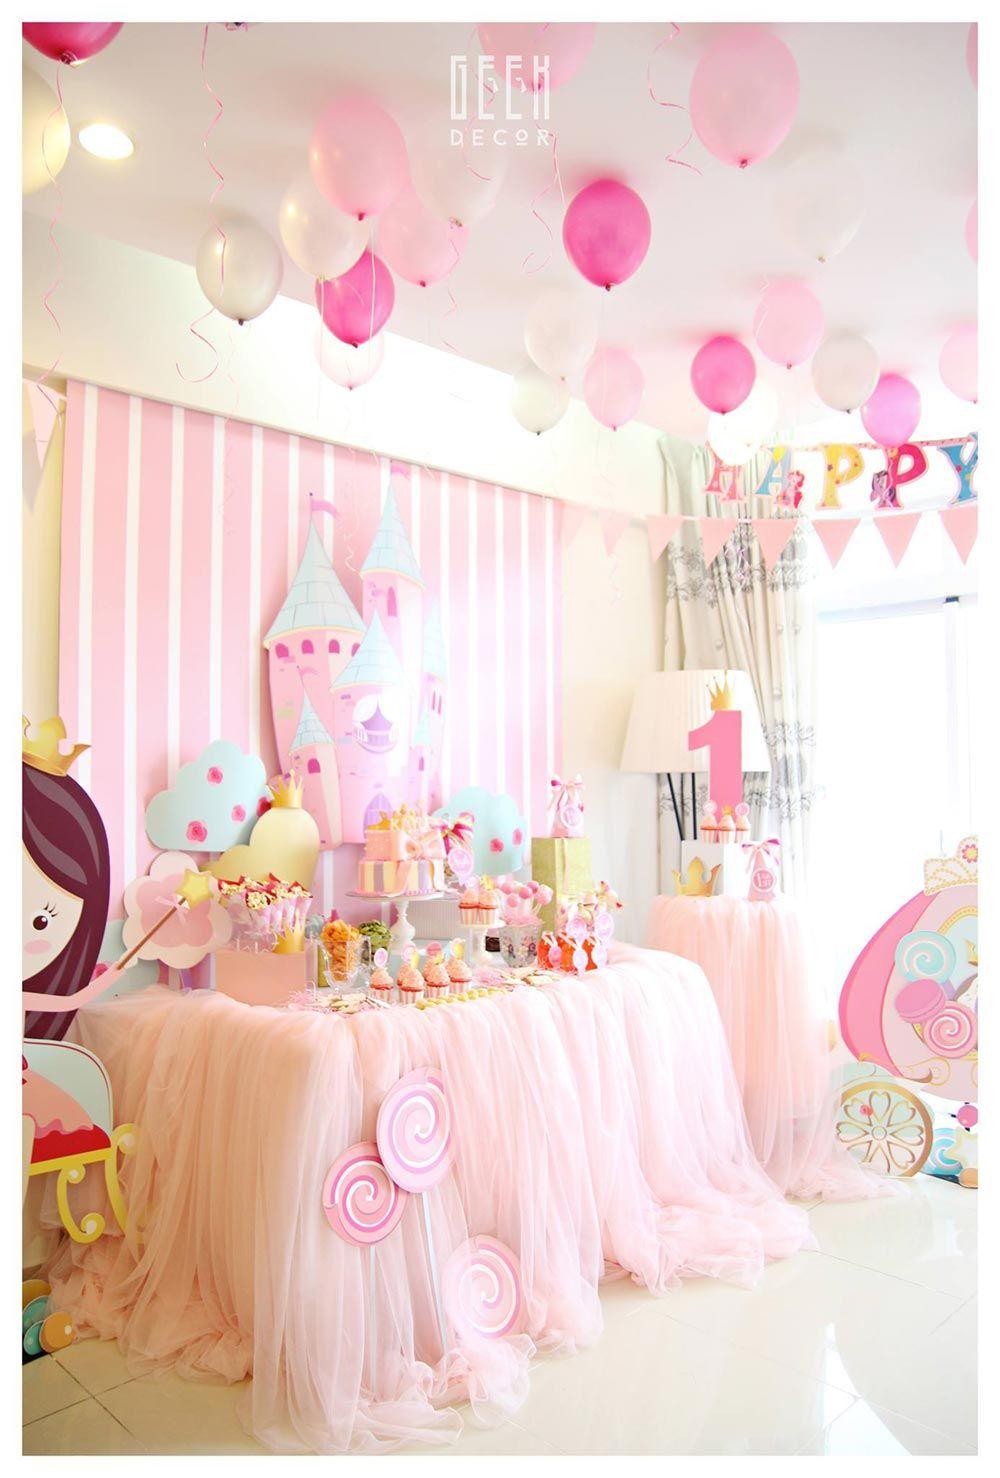 Trang trí sinh nhật bé Kayla - Chủ đề Princess